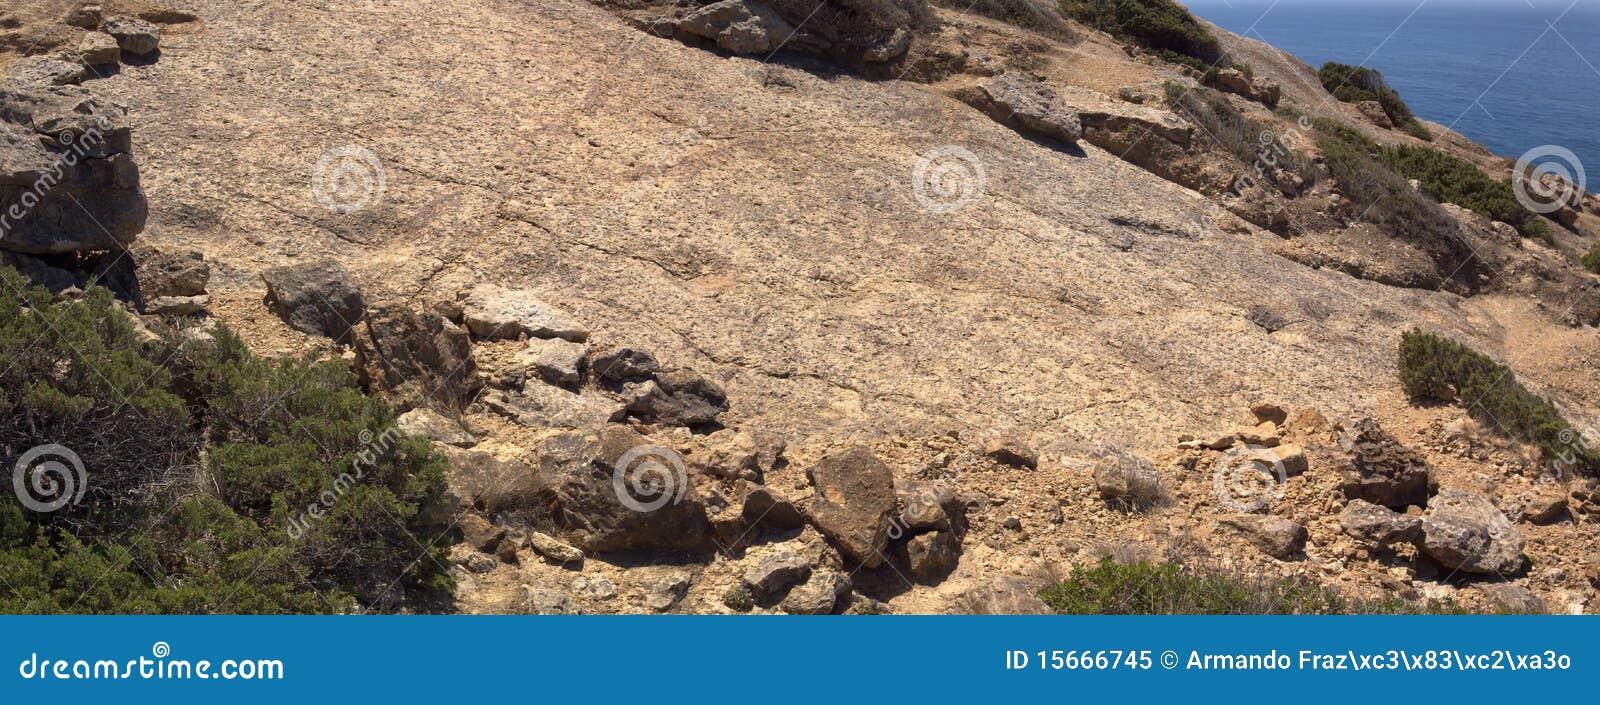 Sauropod Dinosaur footprint trail